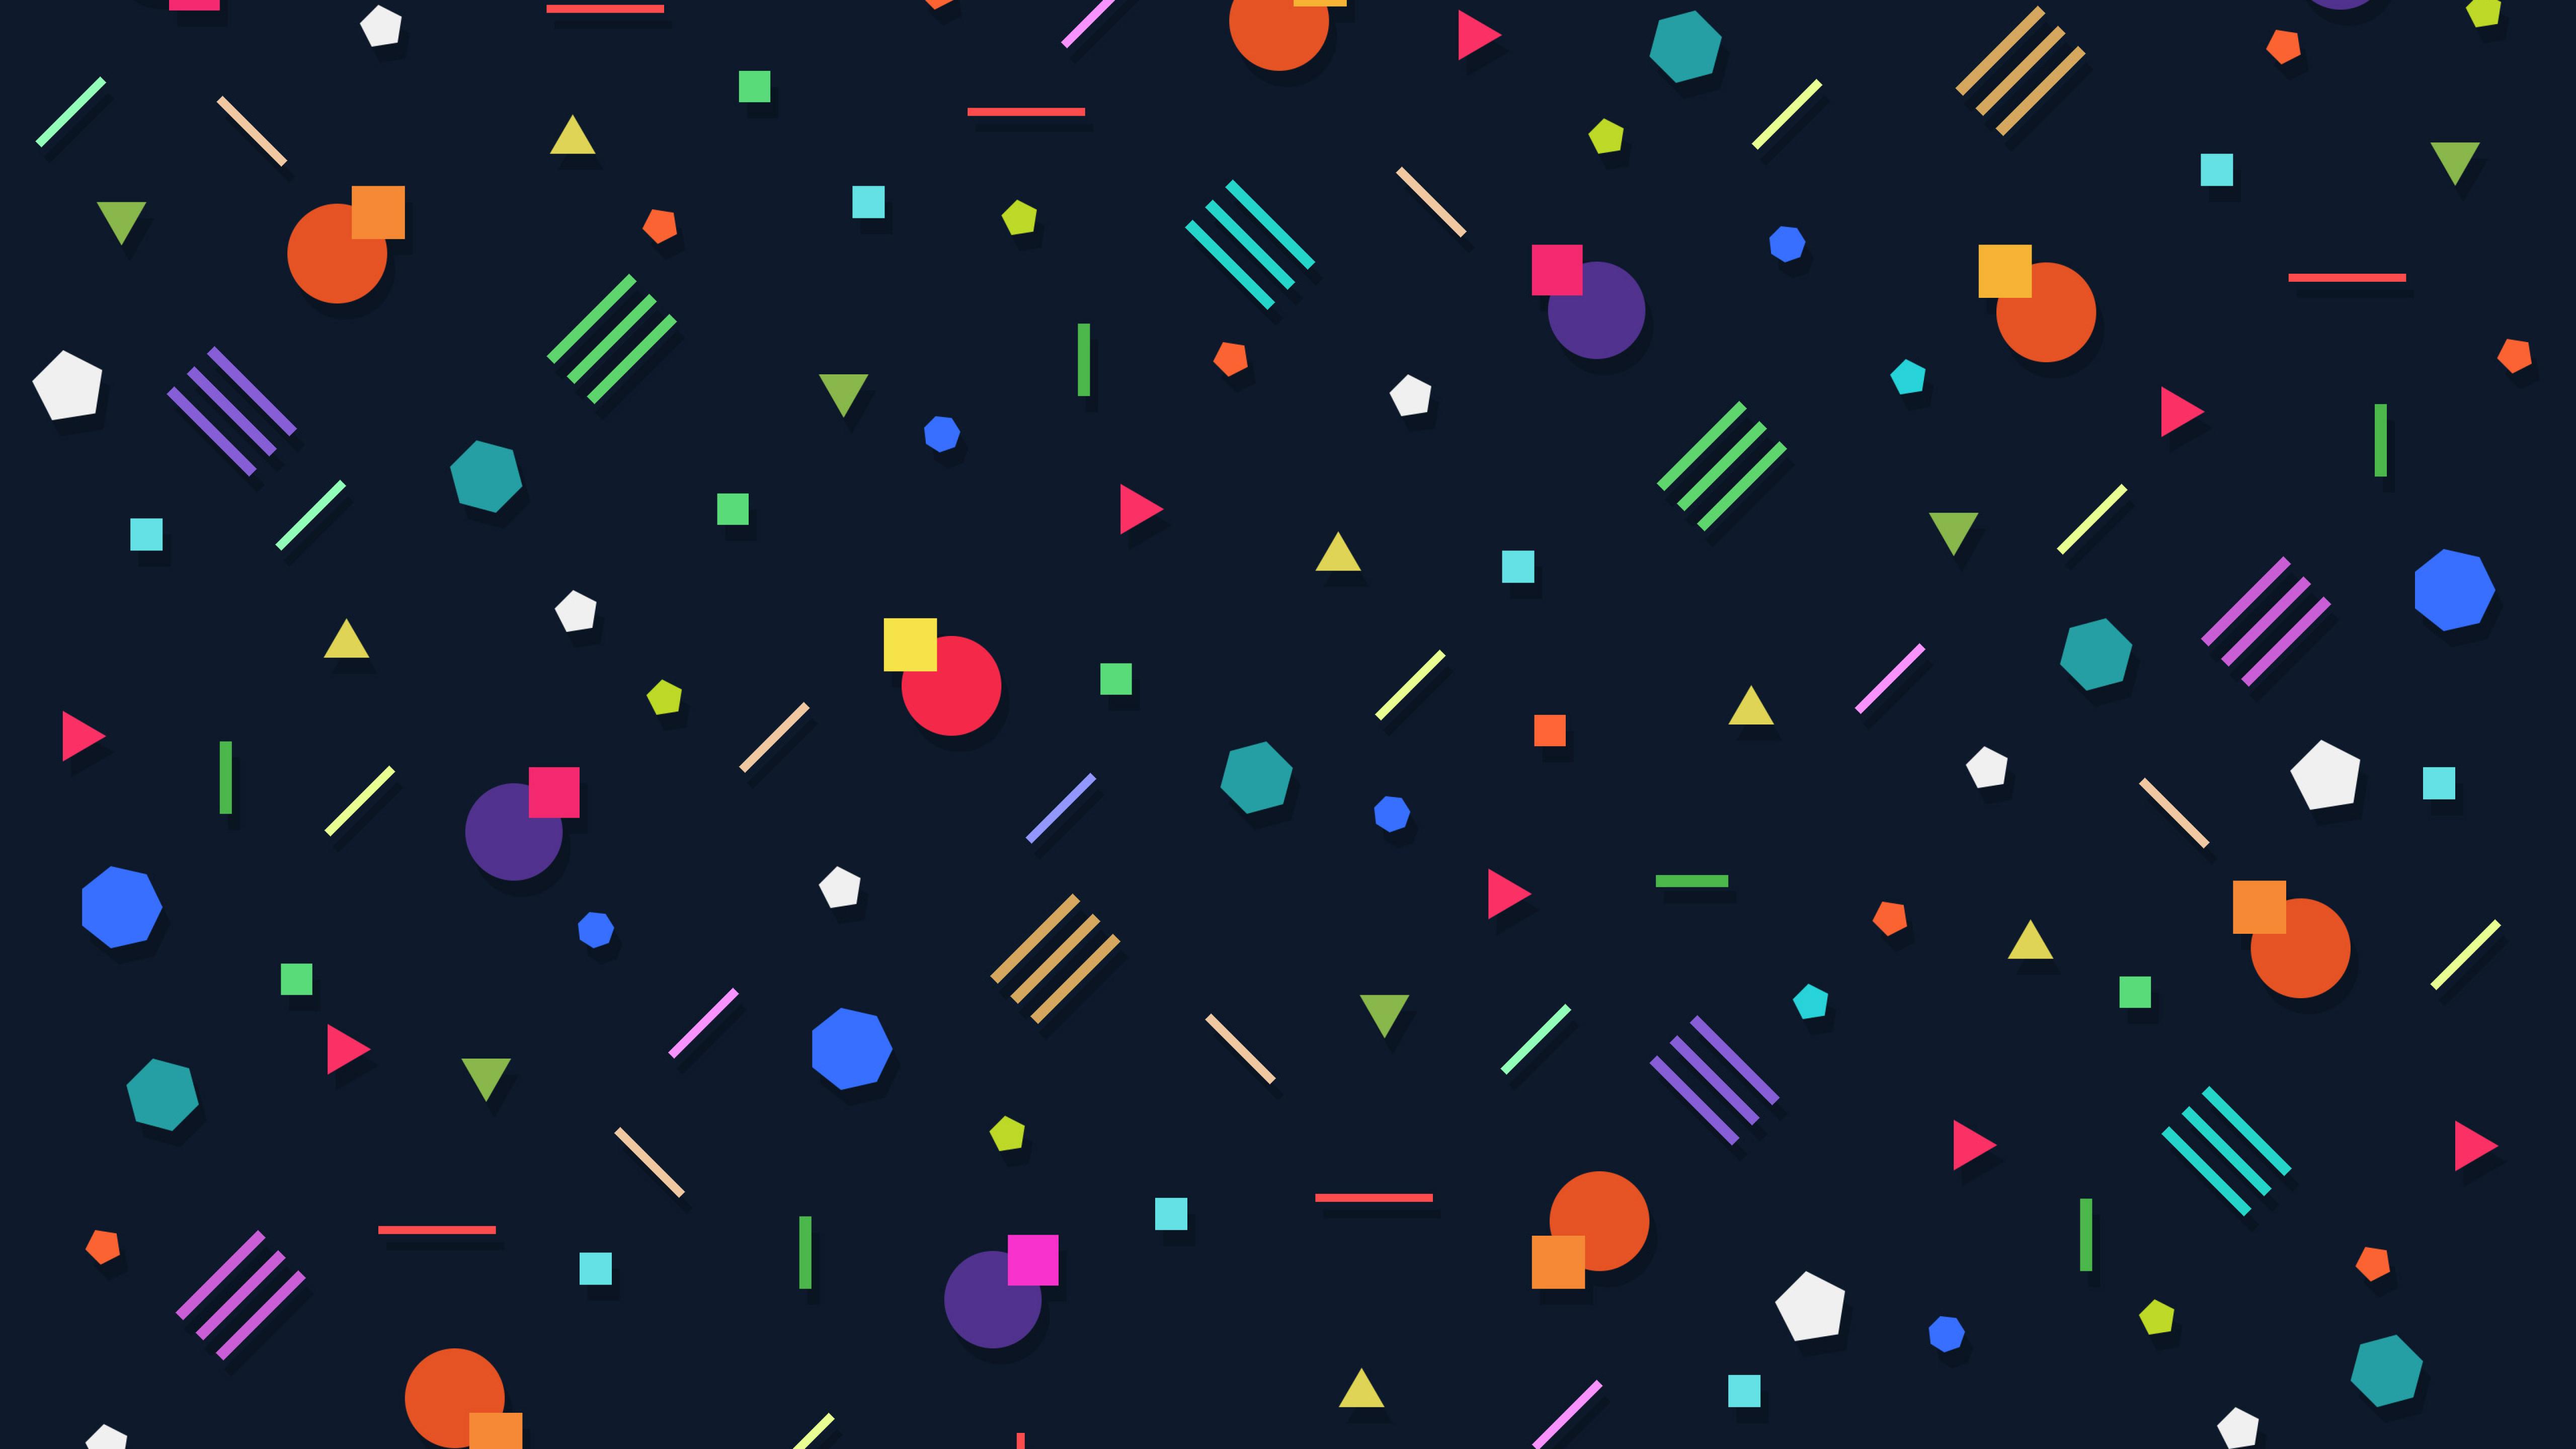 Geometry Abstract HD 4K Wallpaper